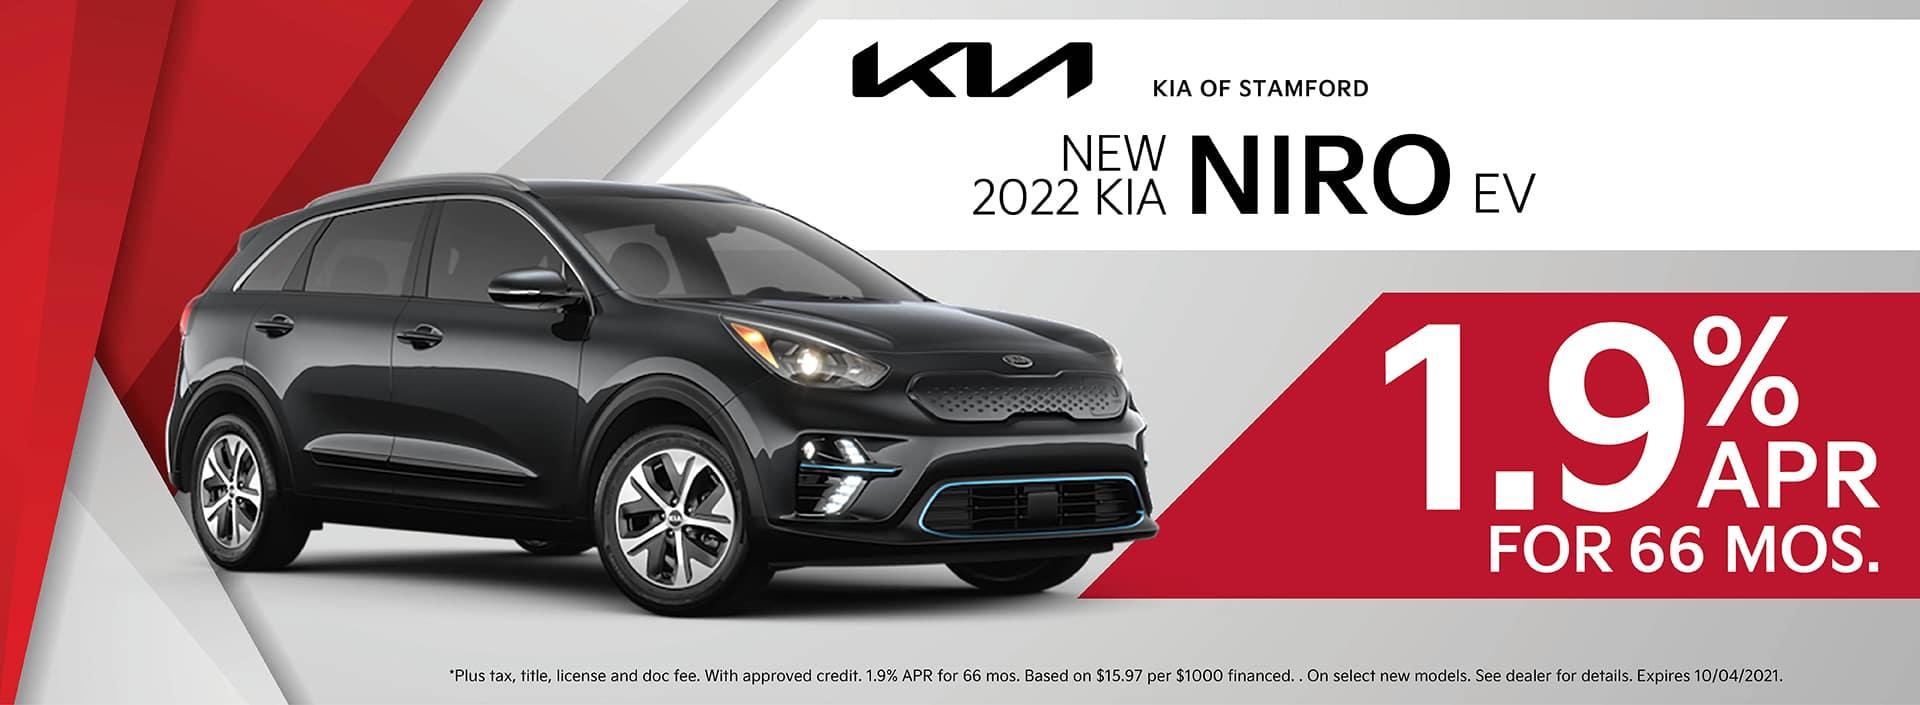 2022 Kia Niro Finance Offer   Kia of Stamford